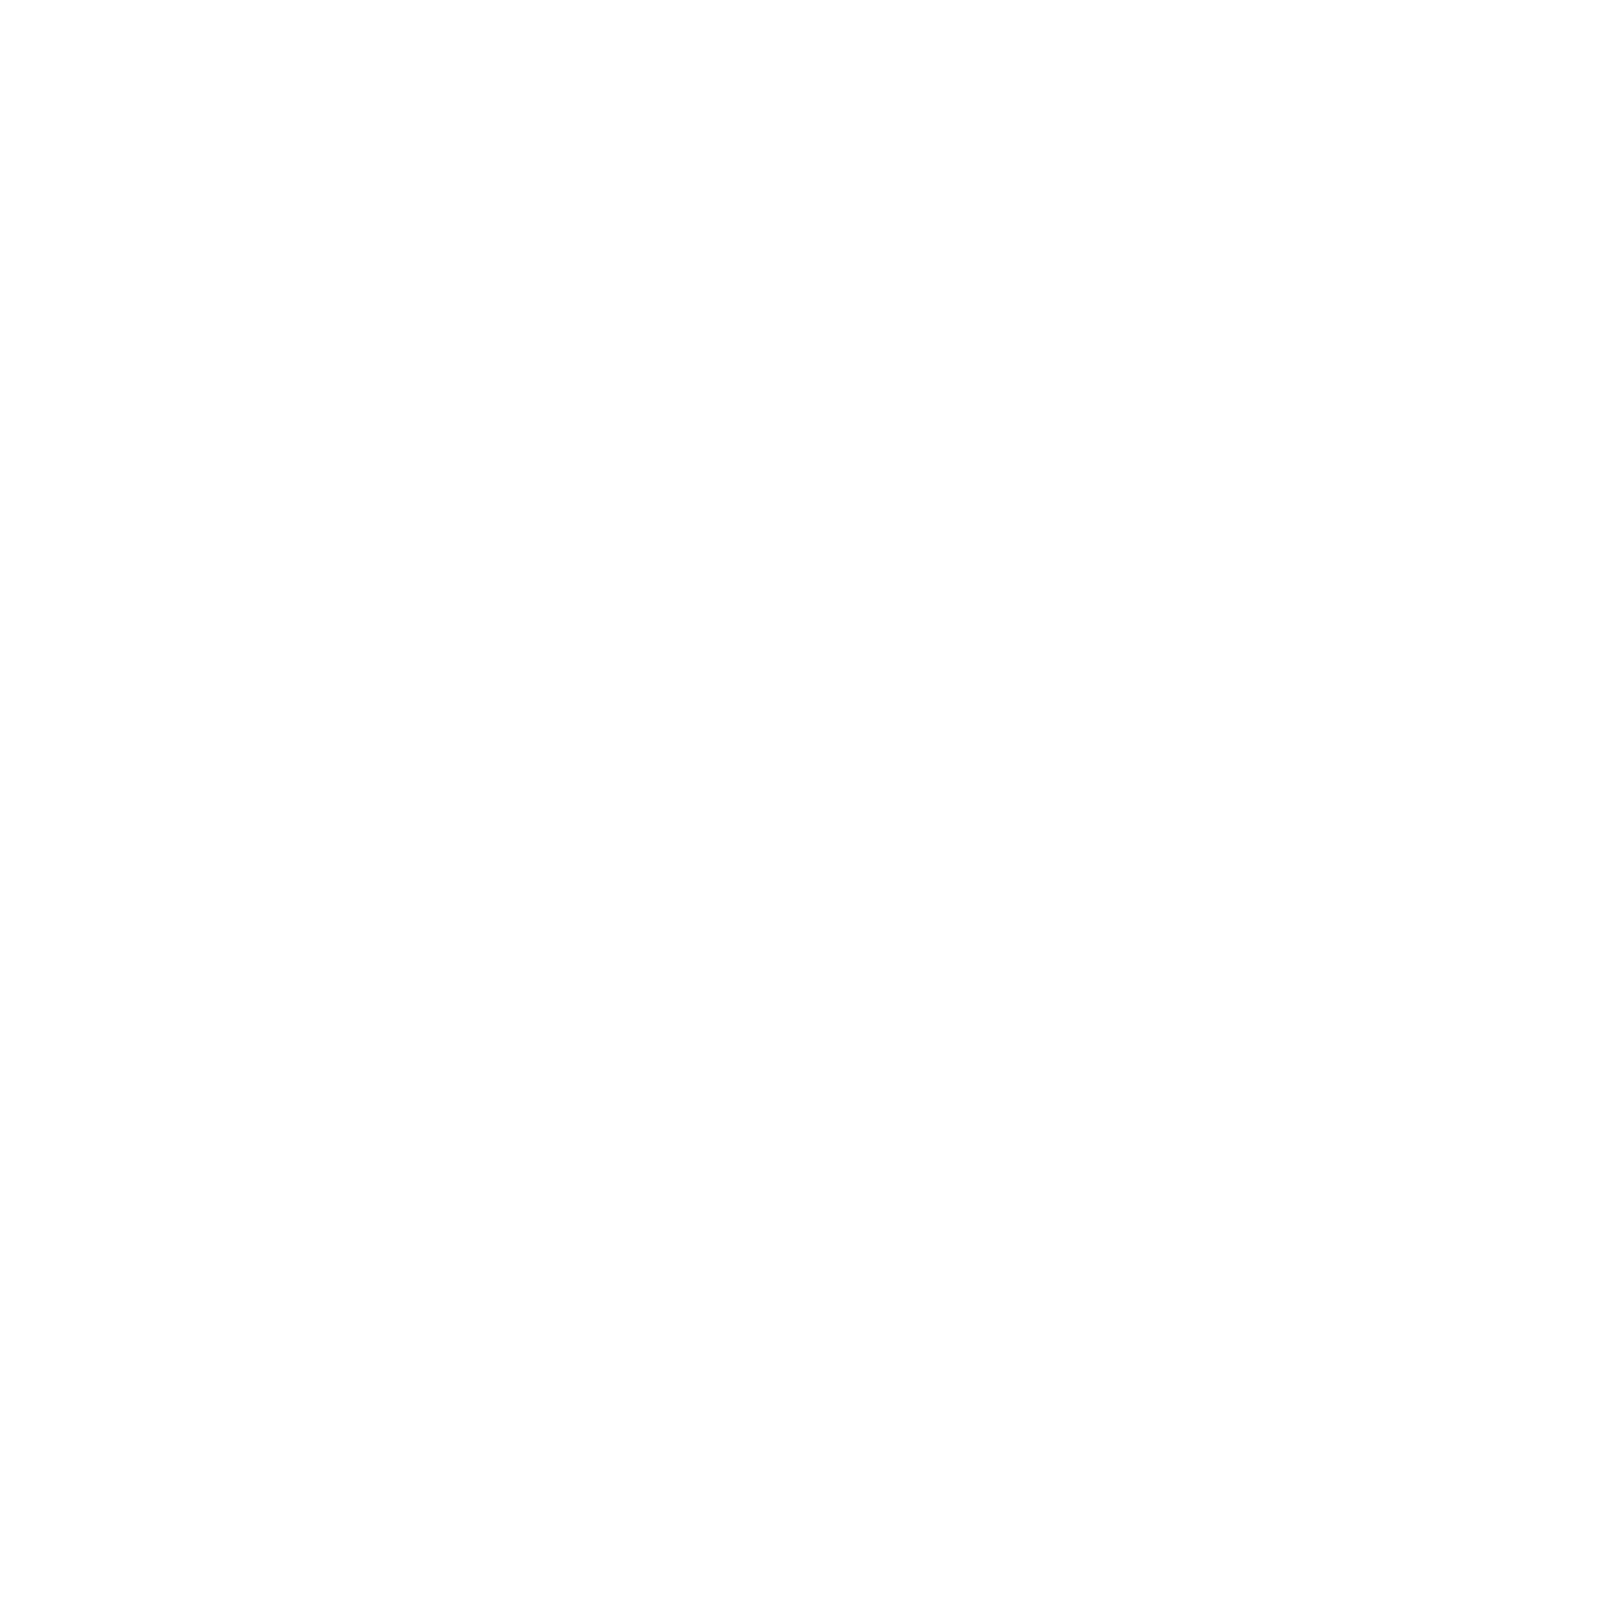 Green Design Solutions